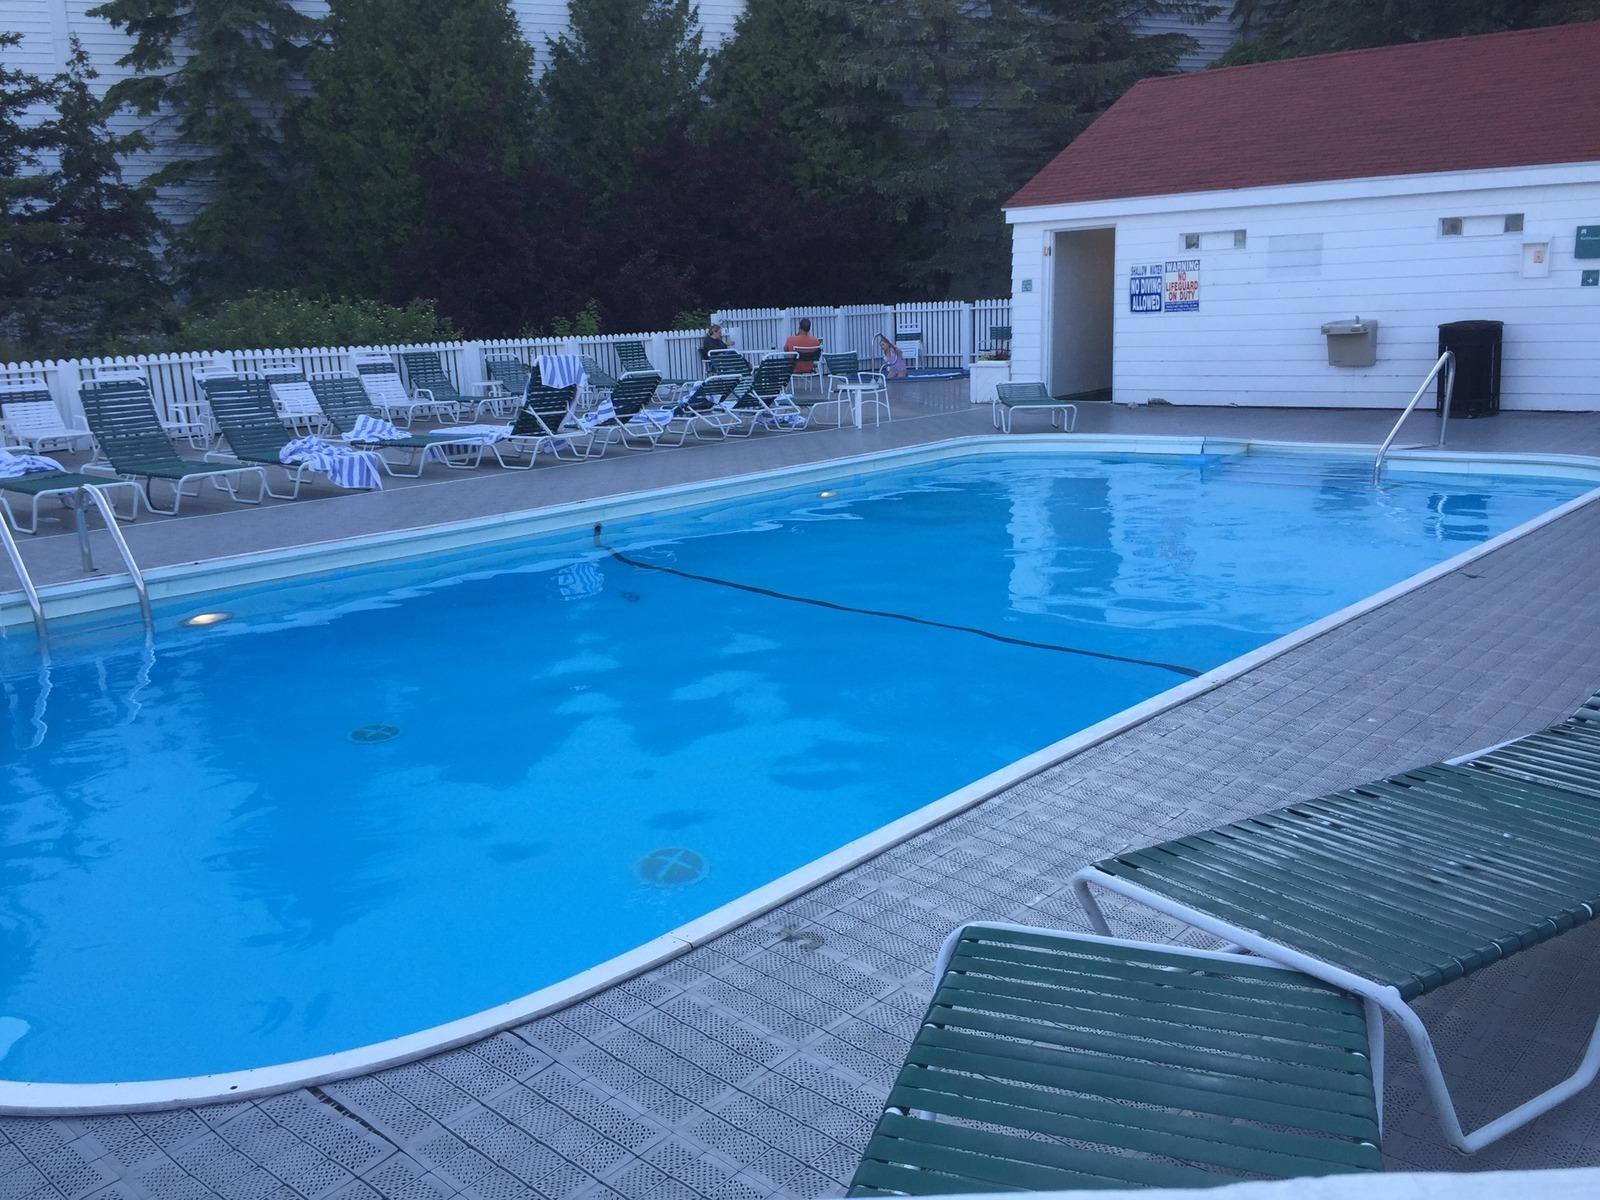 Cheap Hotels In Mackinac Island Michigan